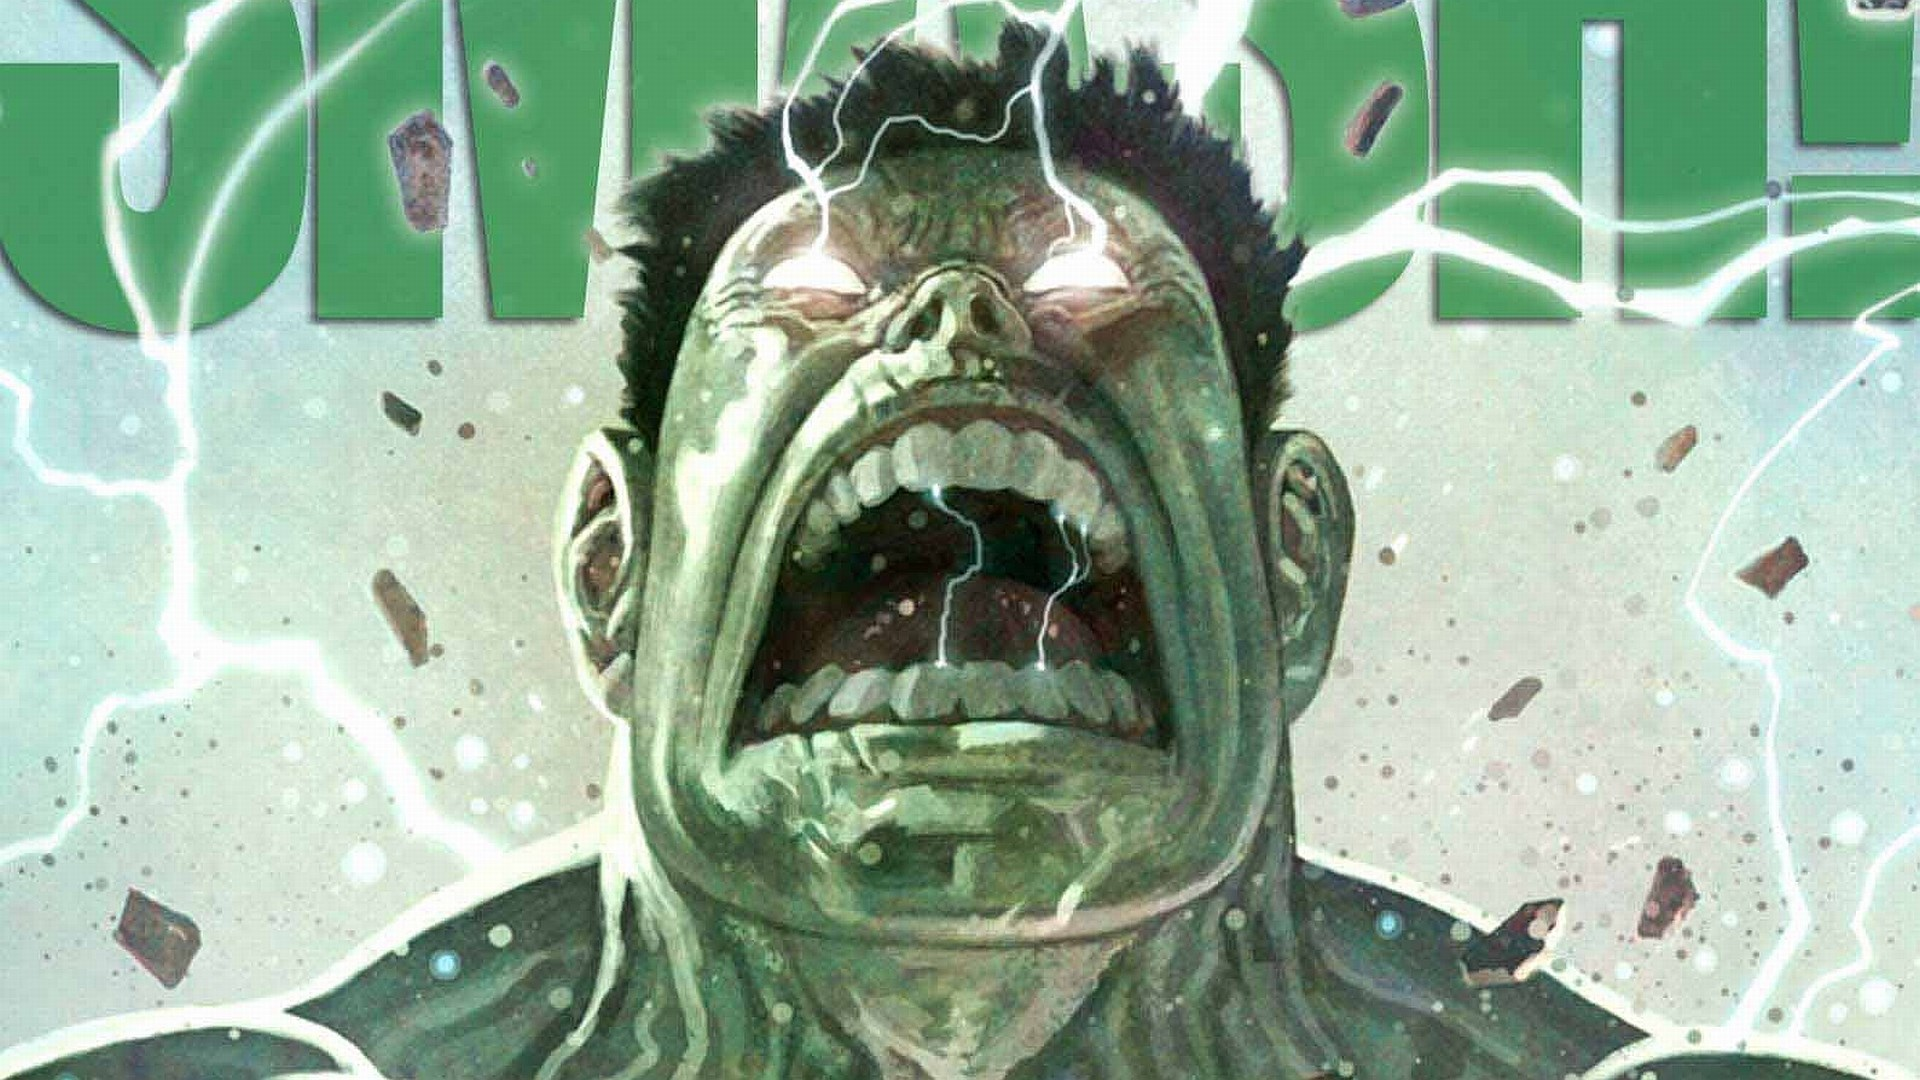 1920x1080-images-hulk-wallpaper-wpc5801014